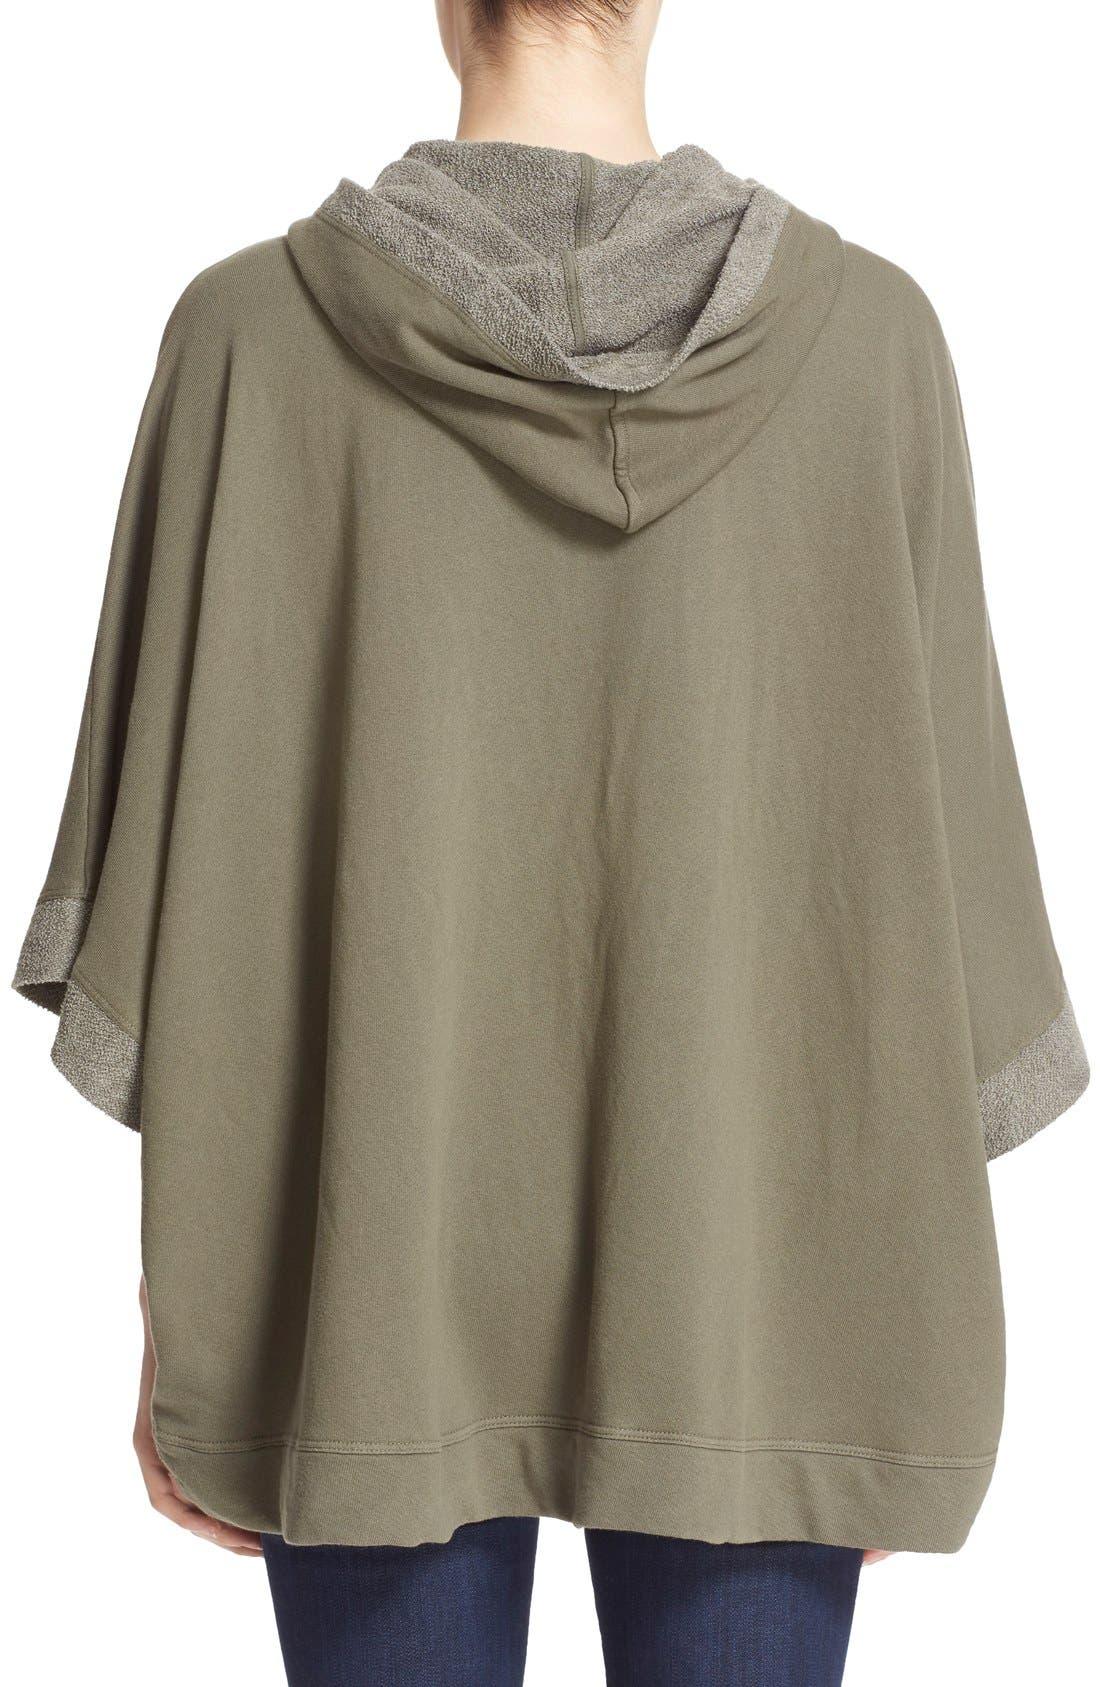 Alternate Image 2  - Soft Joie 'Kory' Boxy Hooded Pullover